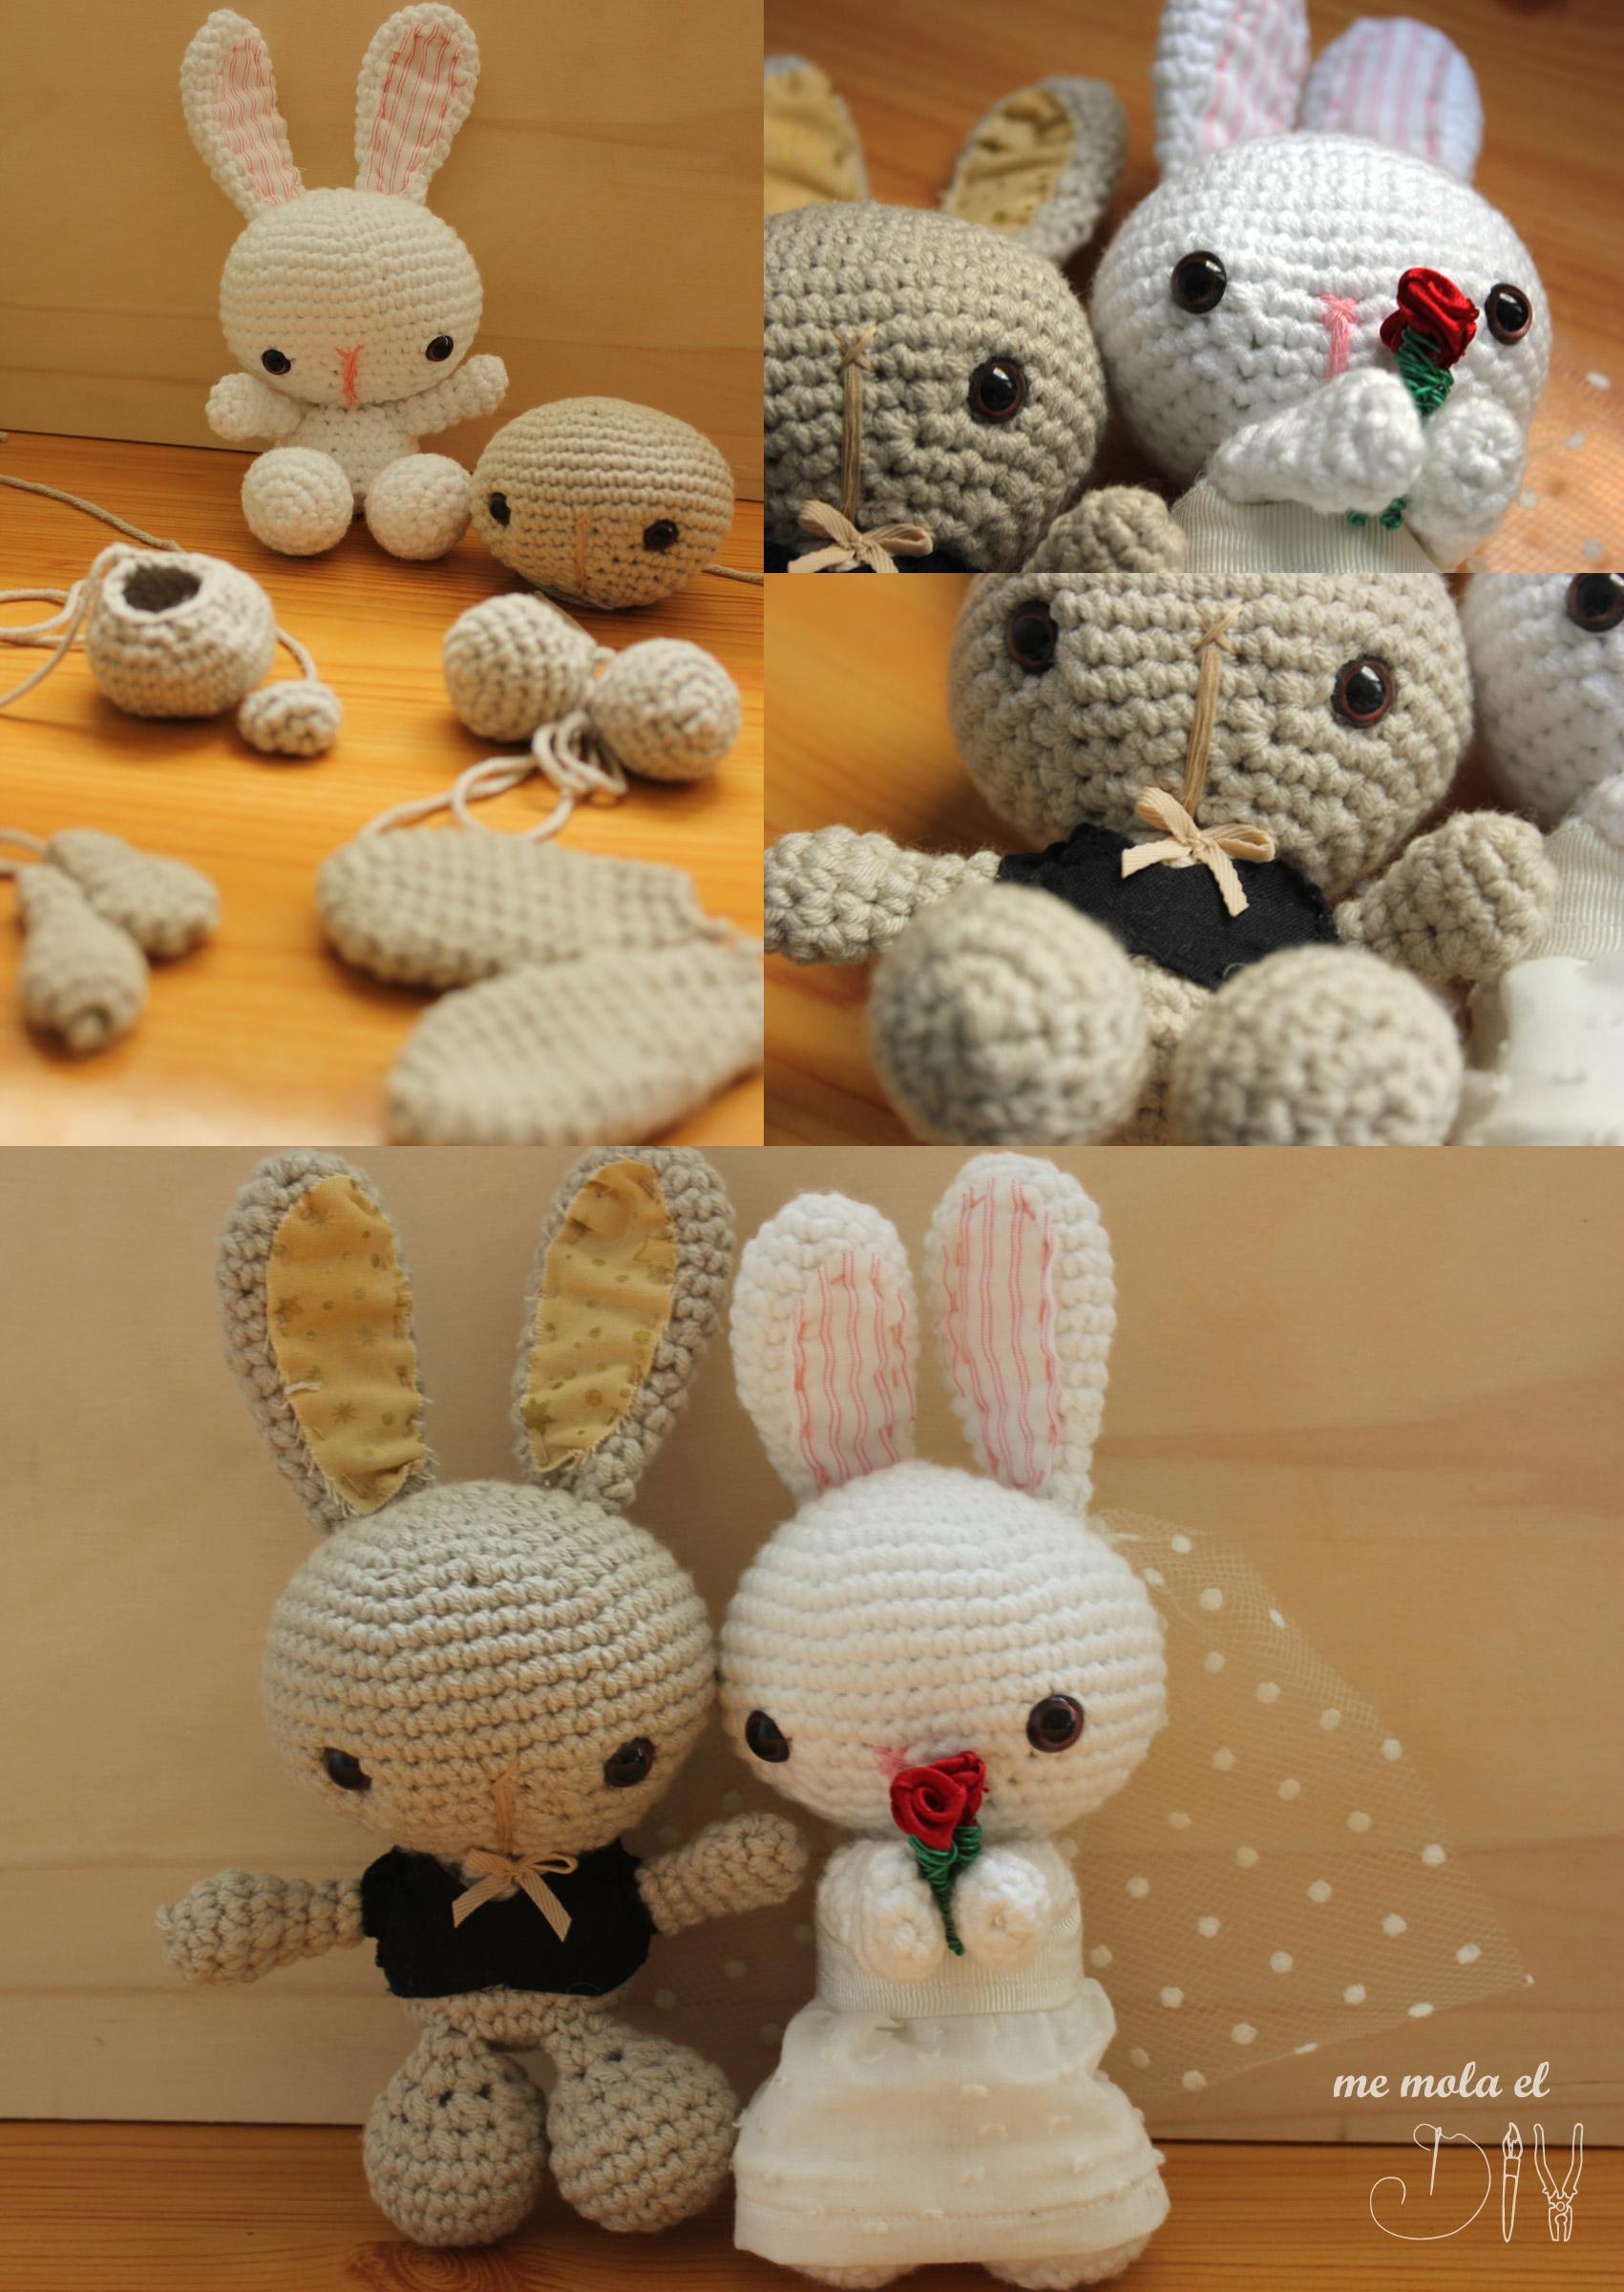 como hacer pareja de novios boda crochet